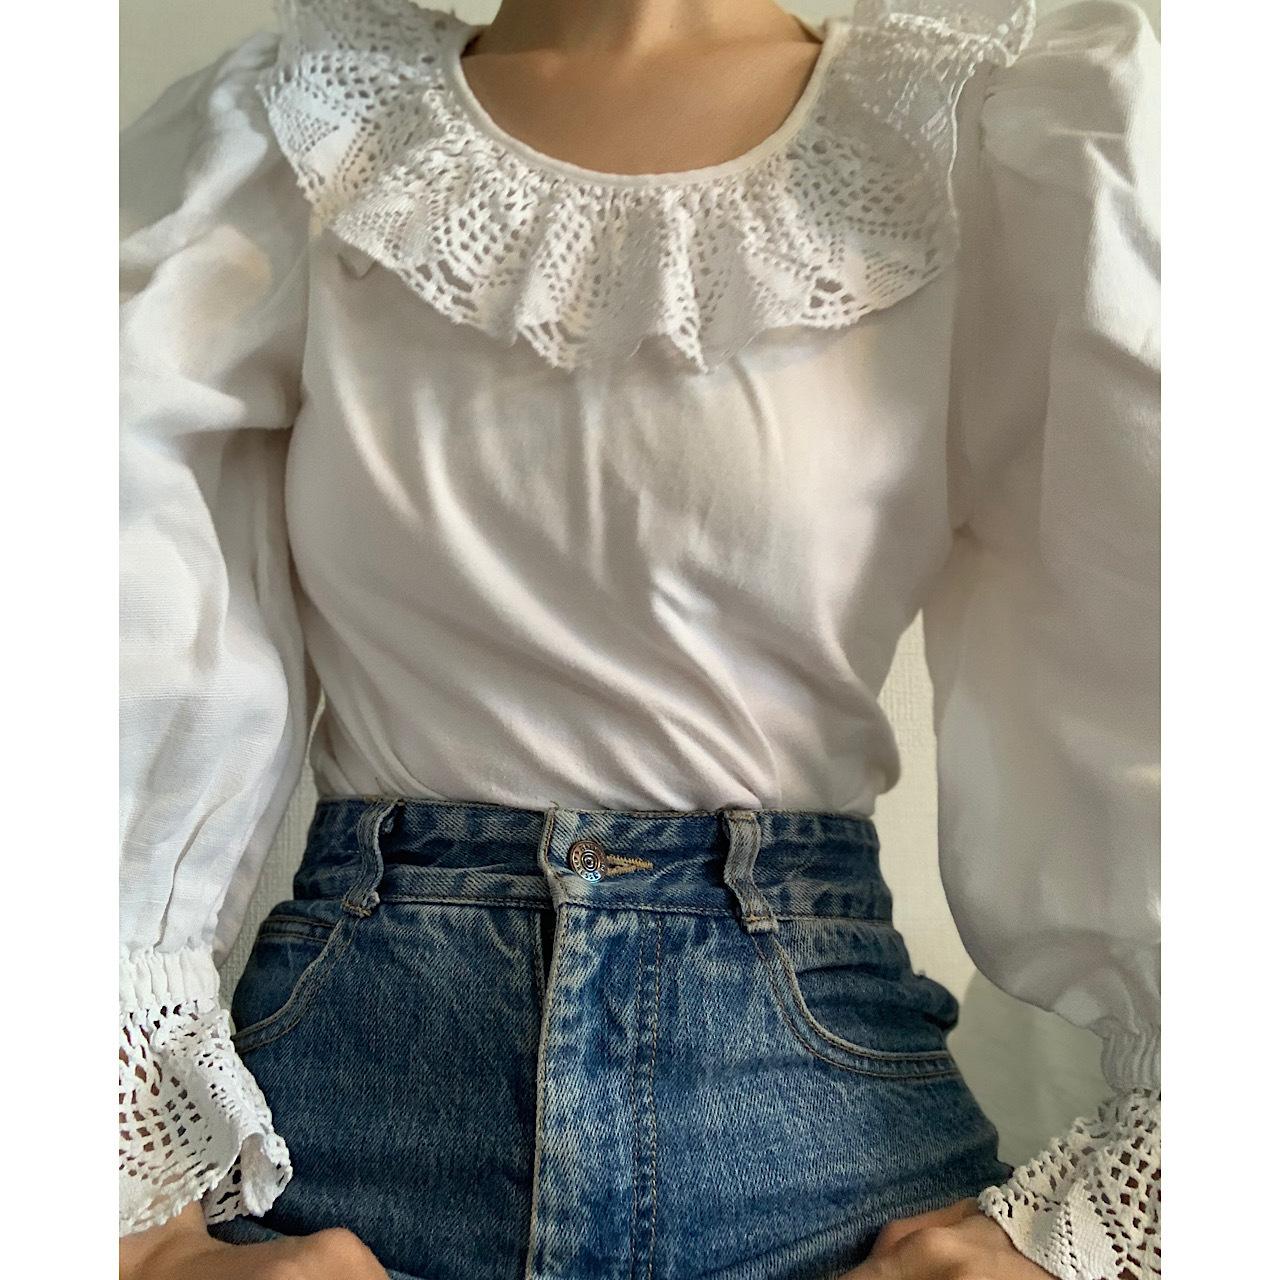 【送料無料】Vintage Dirndl puffy sleeves Austrian blouse